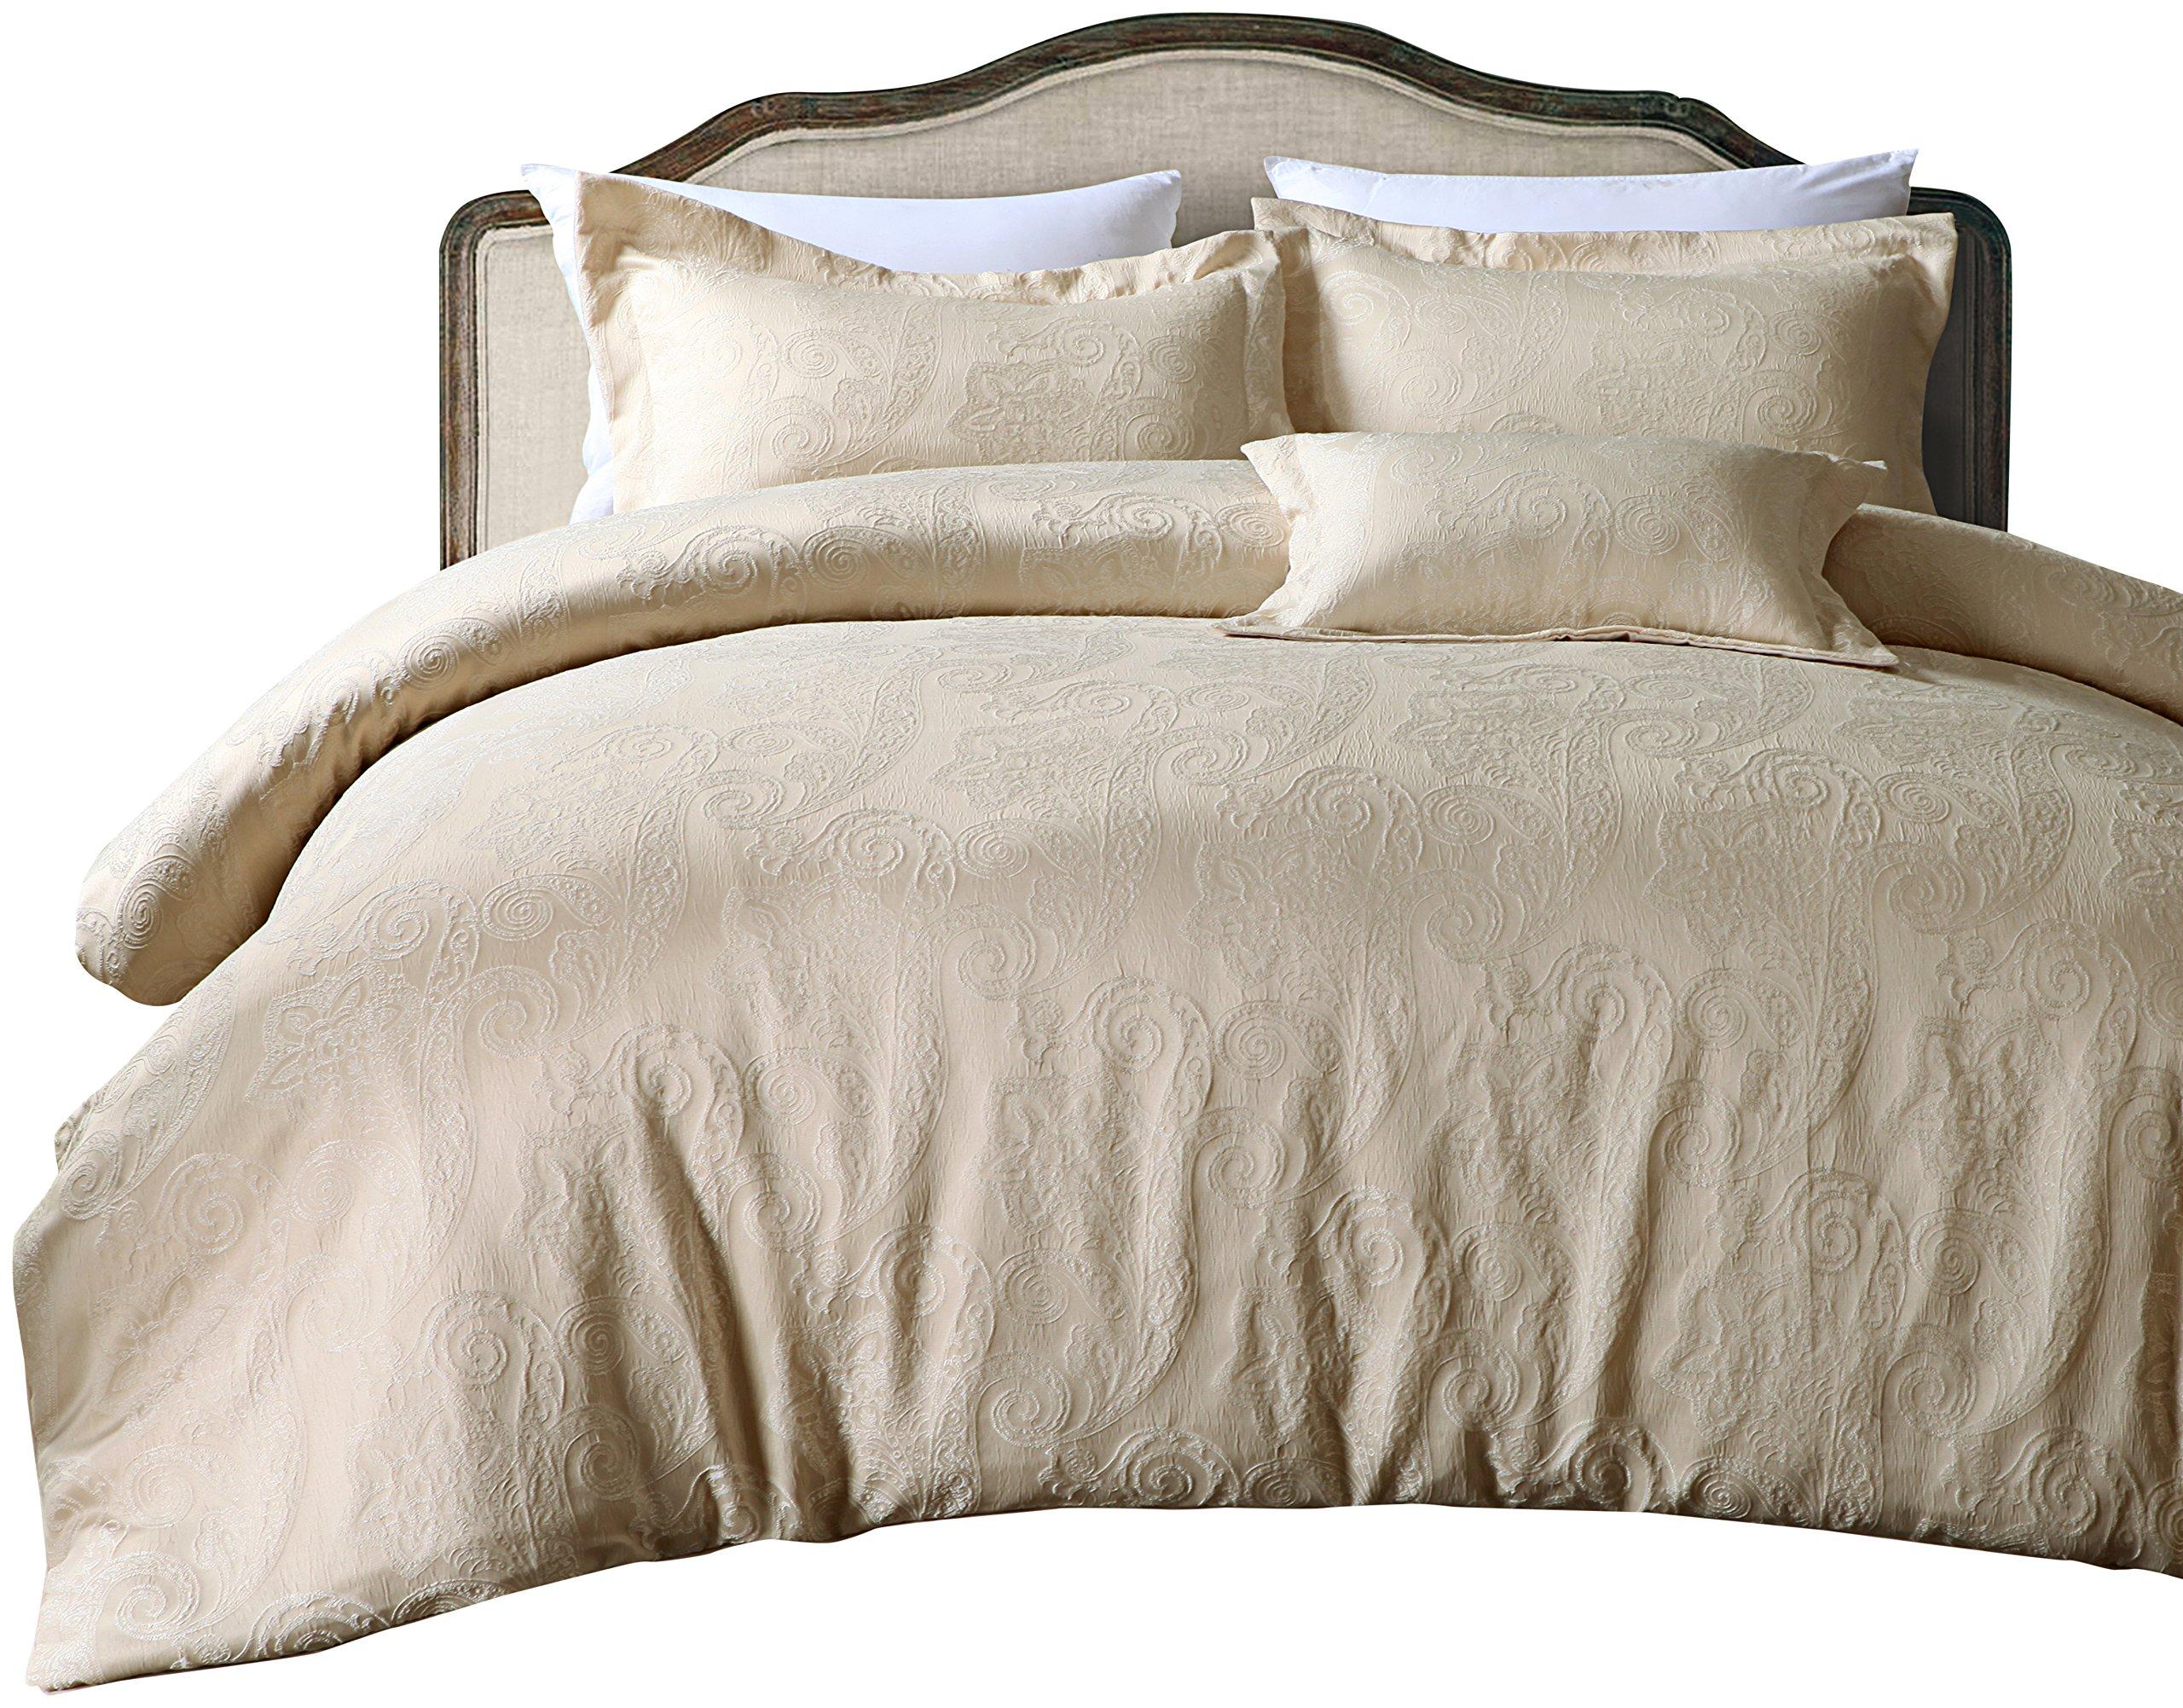 California Design Den Hotel-Paisley-Luxe-CS Comforter Sets, King, Royal Taupe